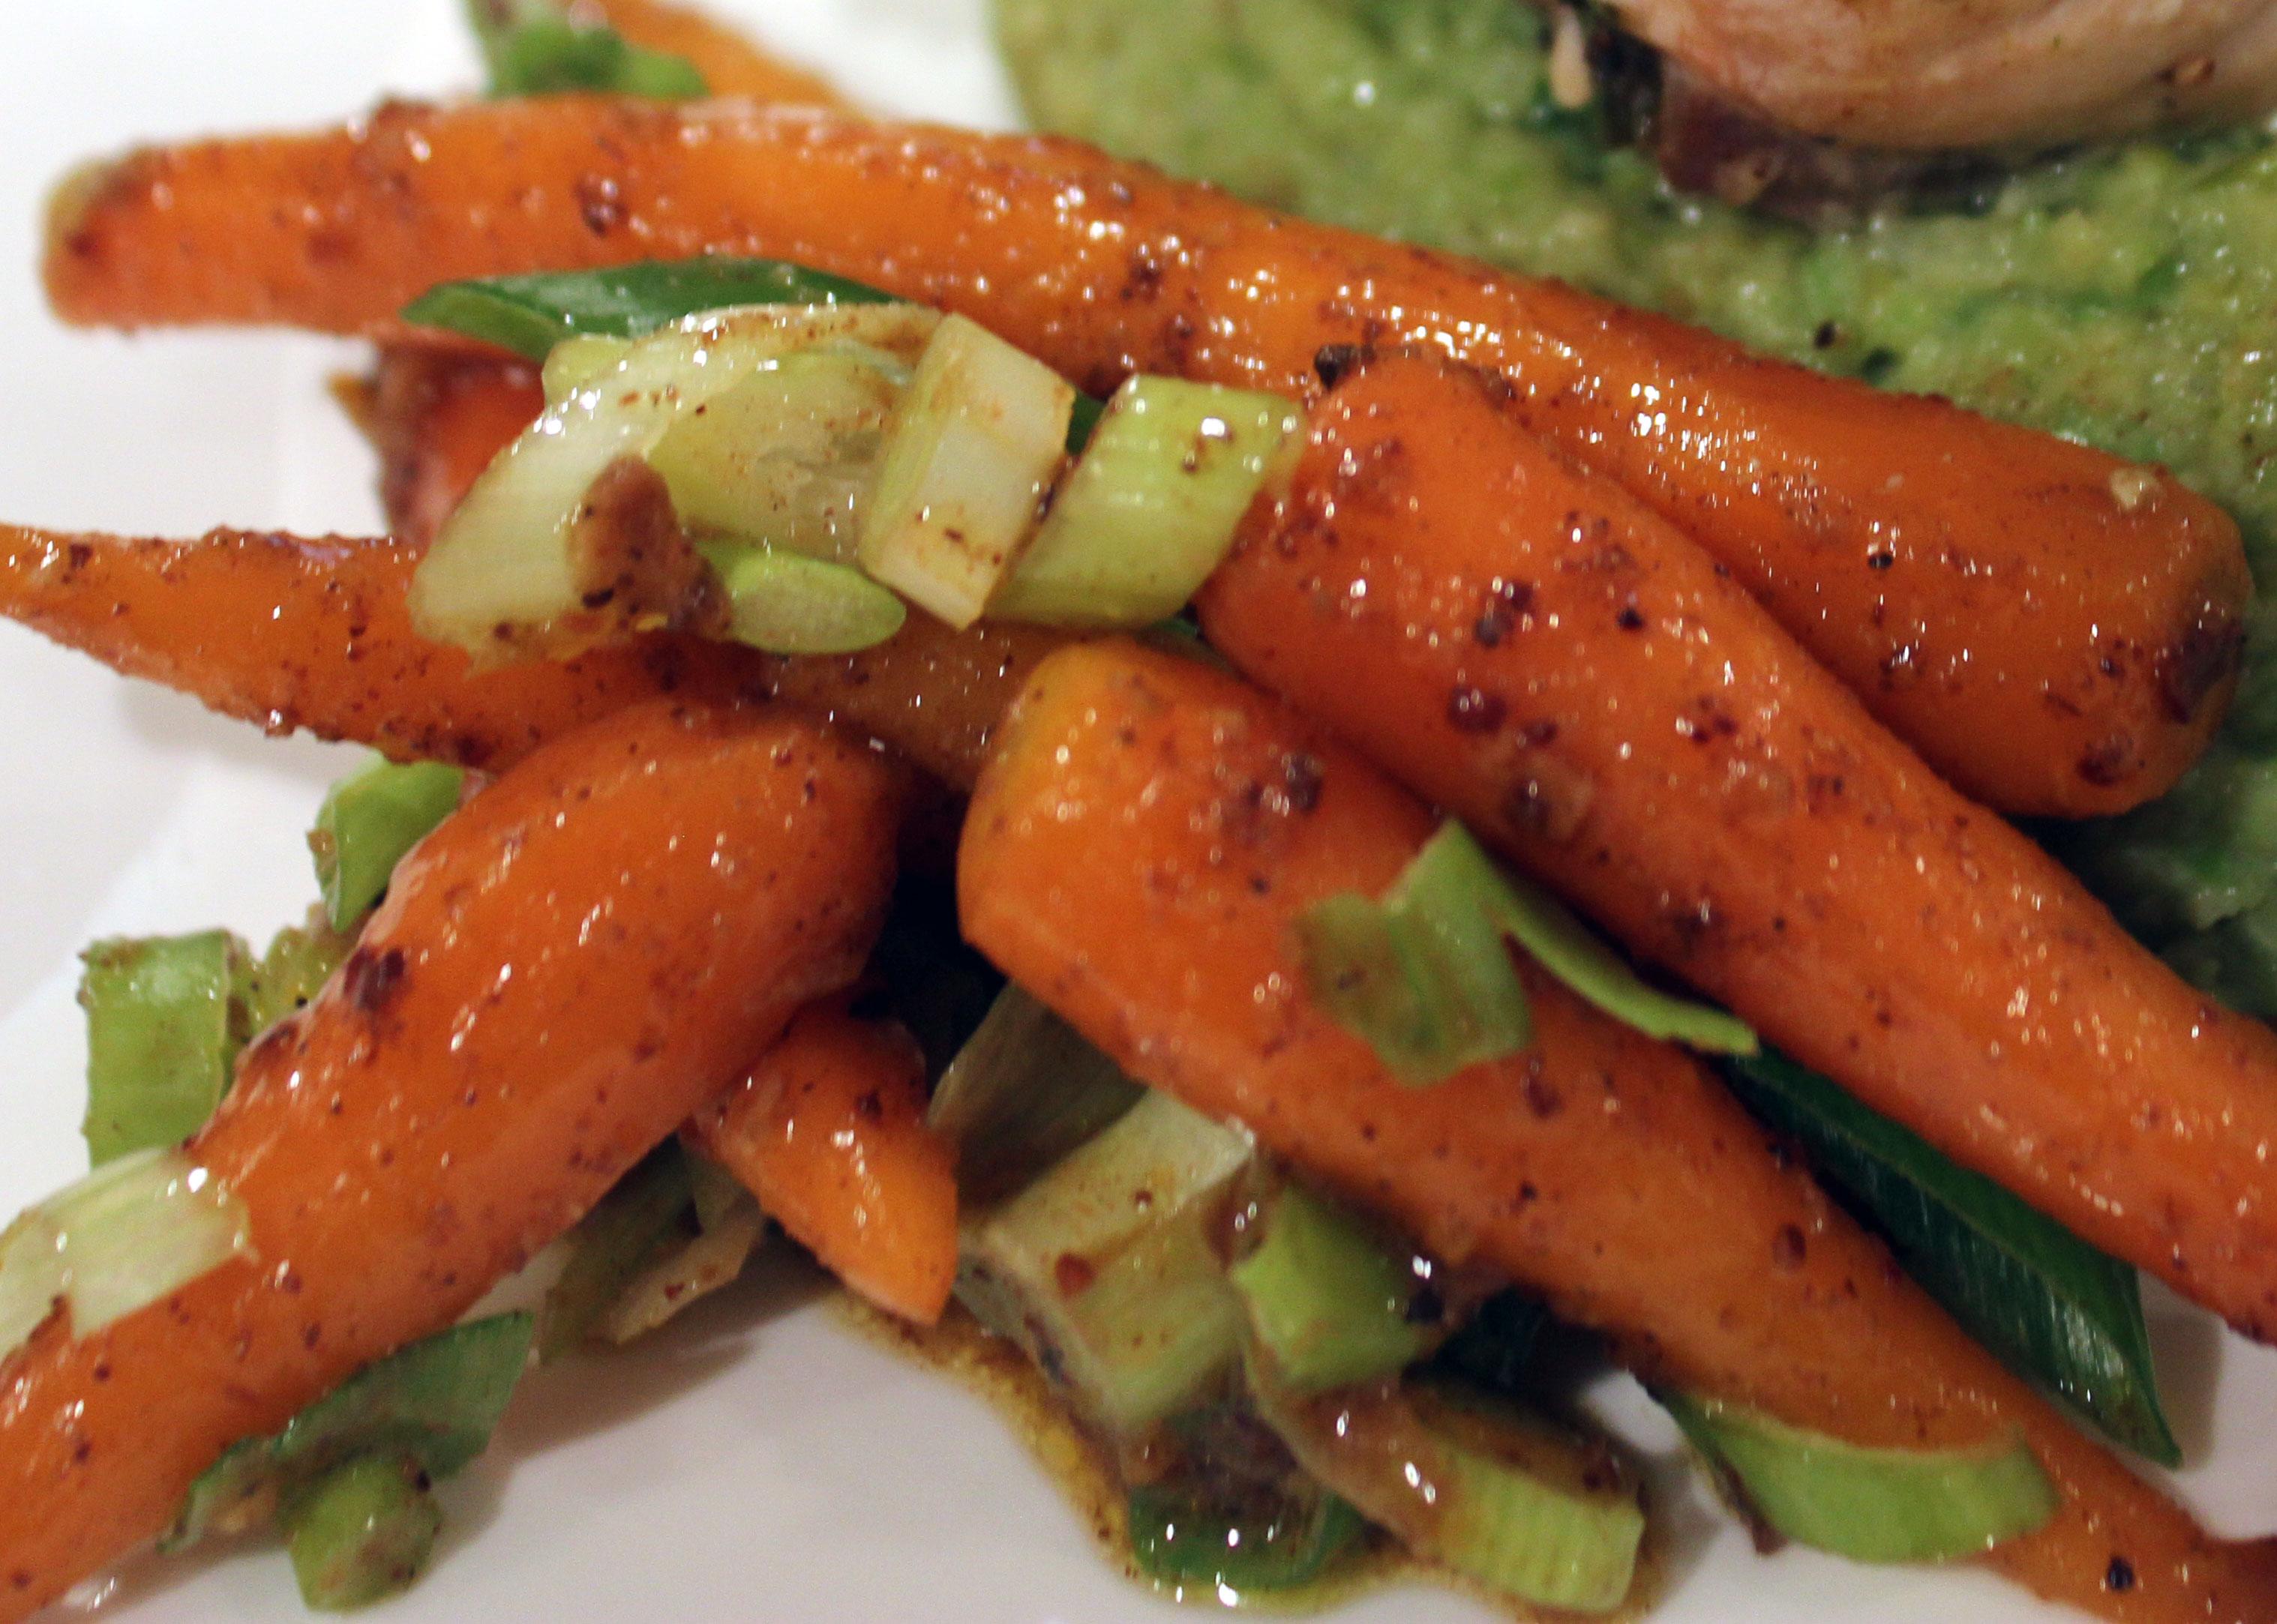 TBT Recipe: Roasted Orange Spiced Carrots